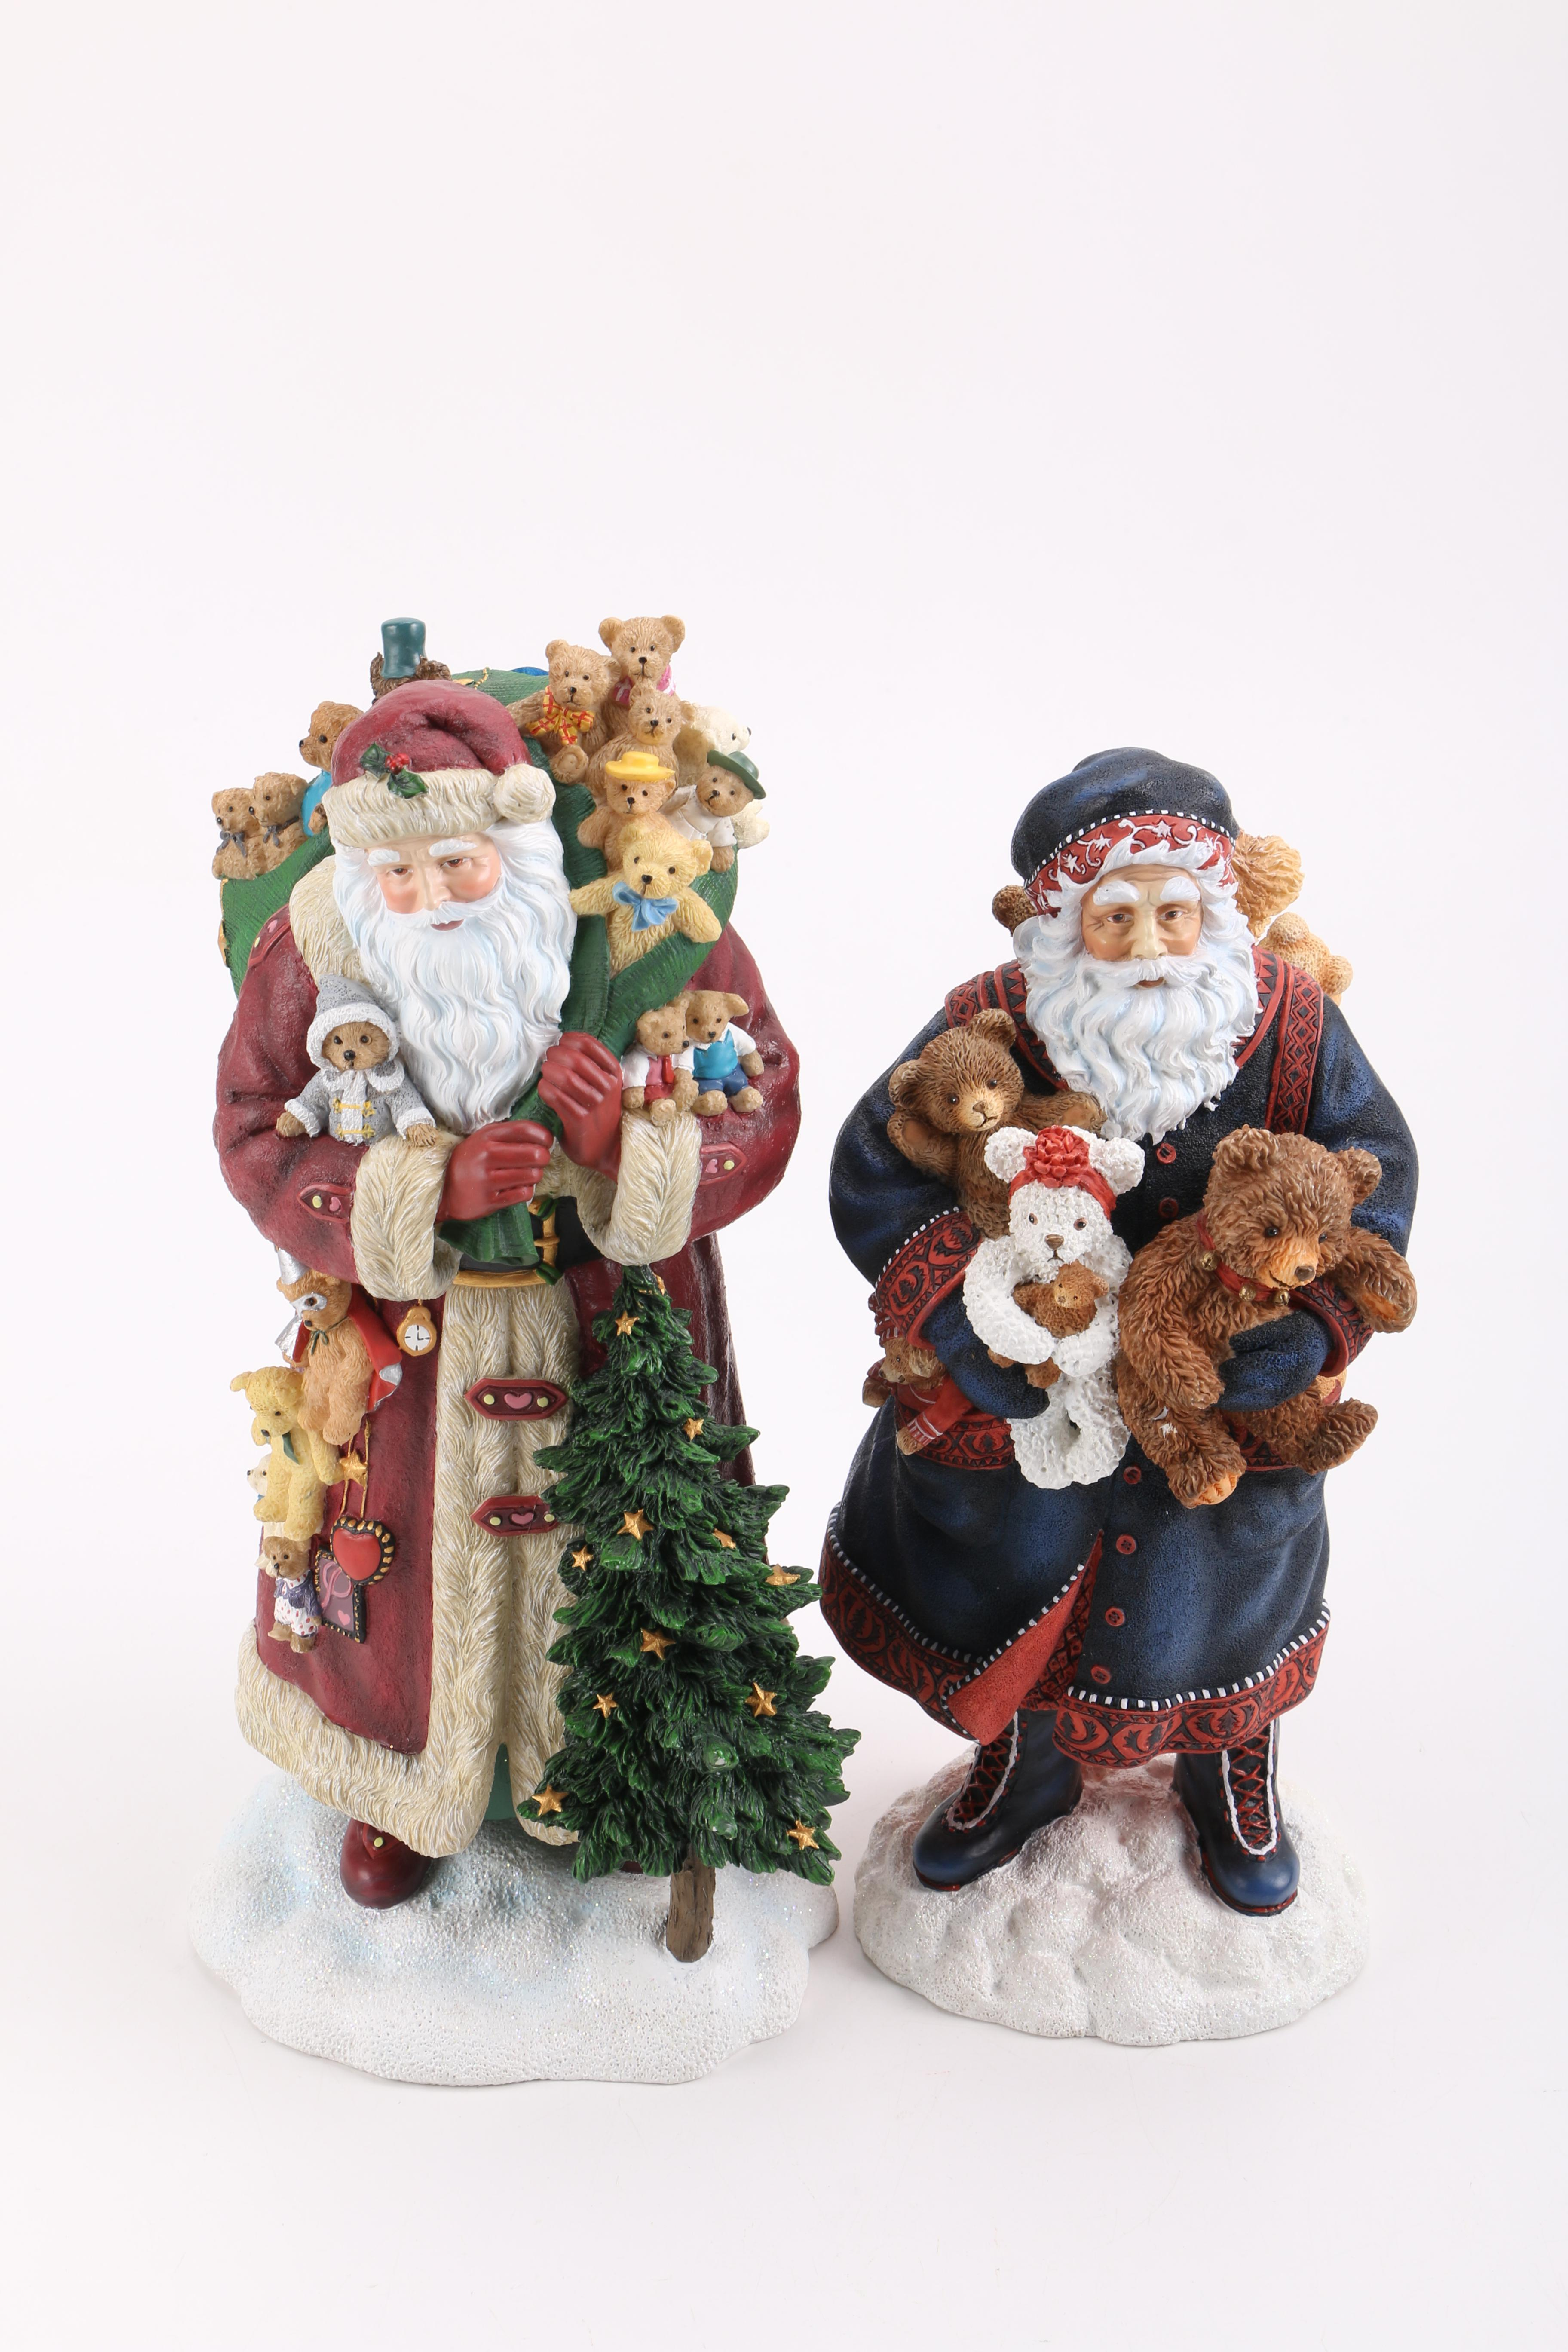 Two Pipka Santa Figurines